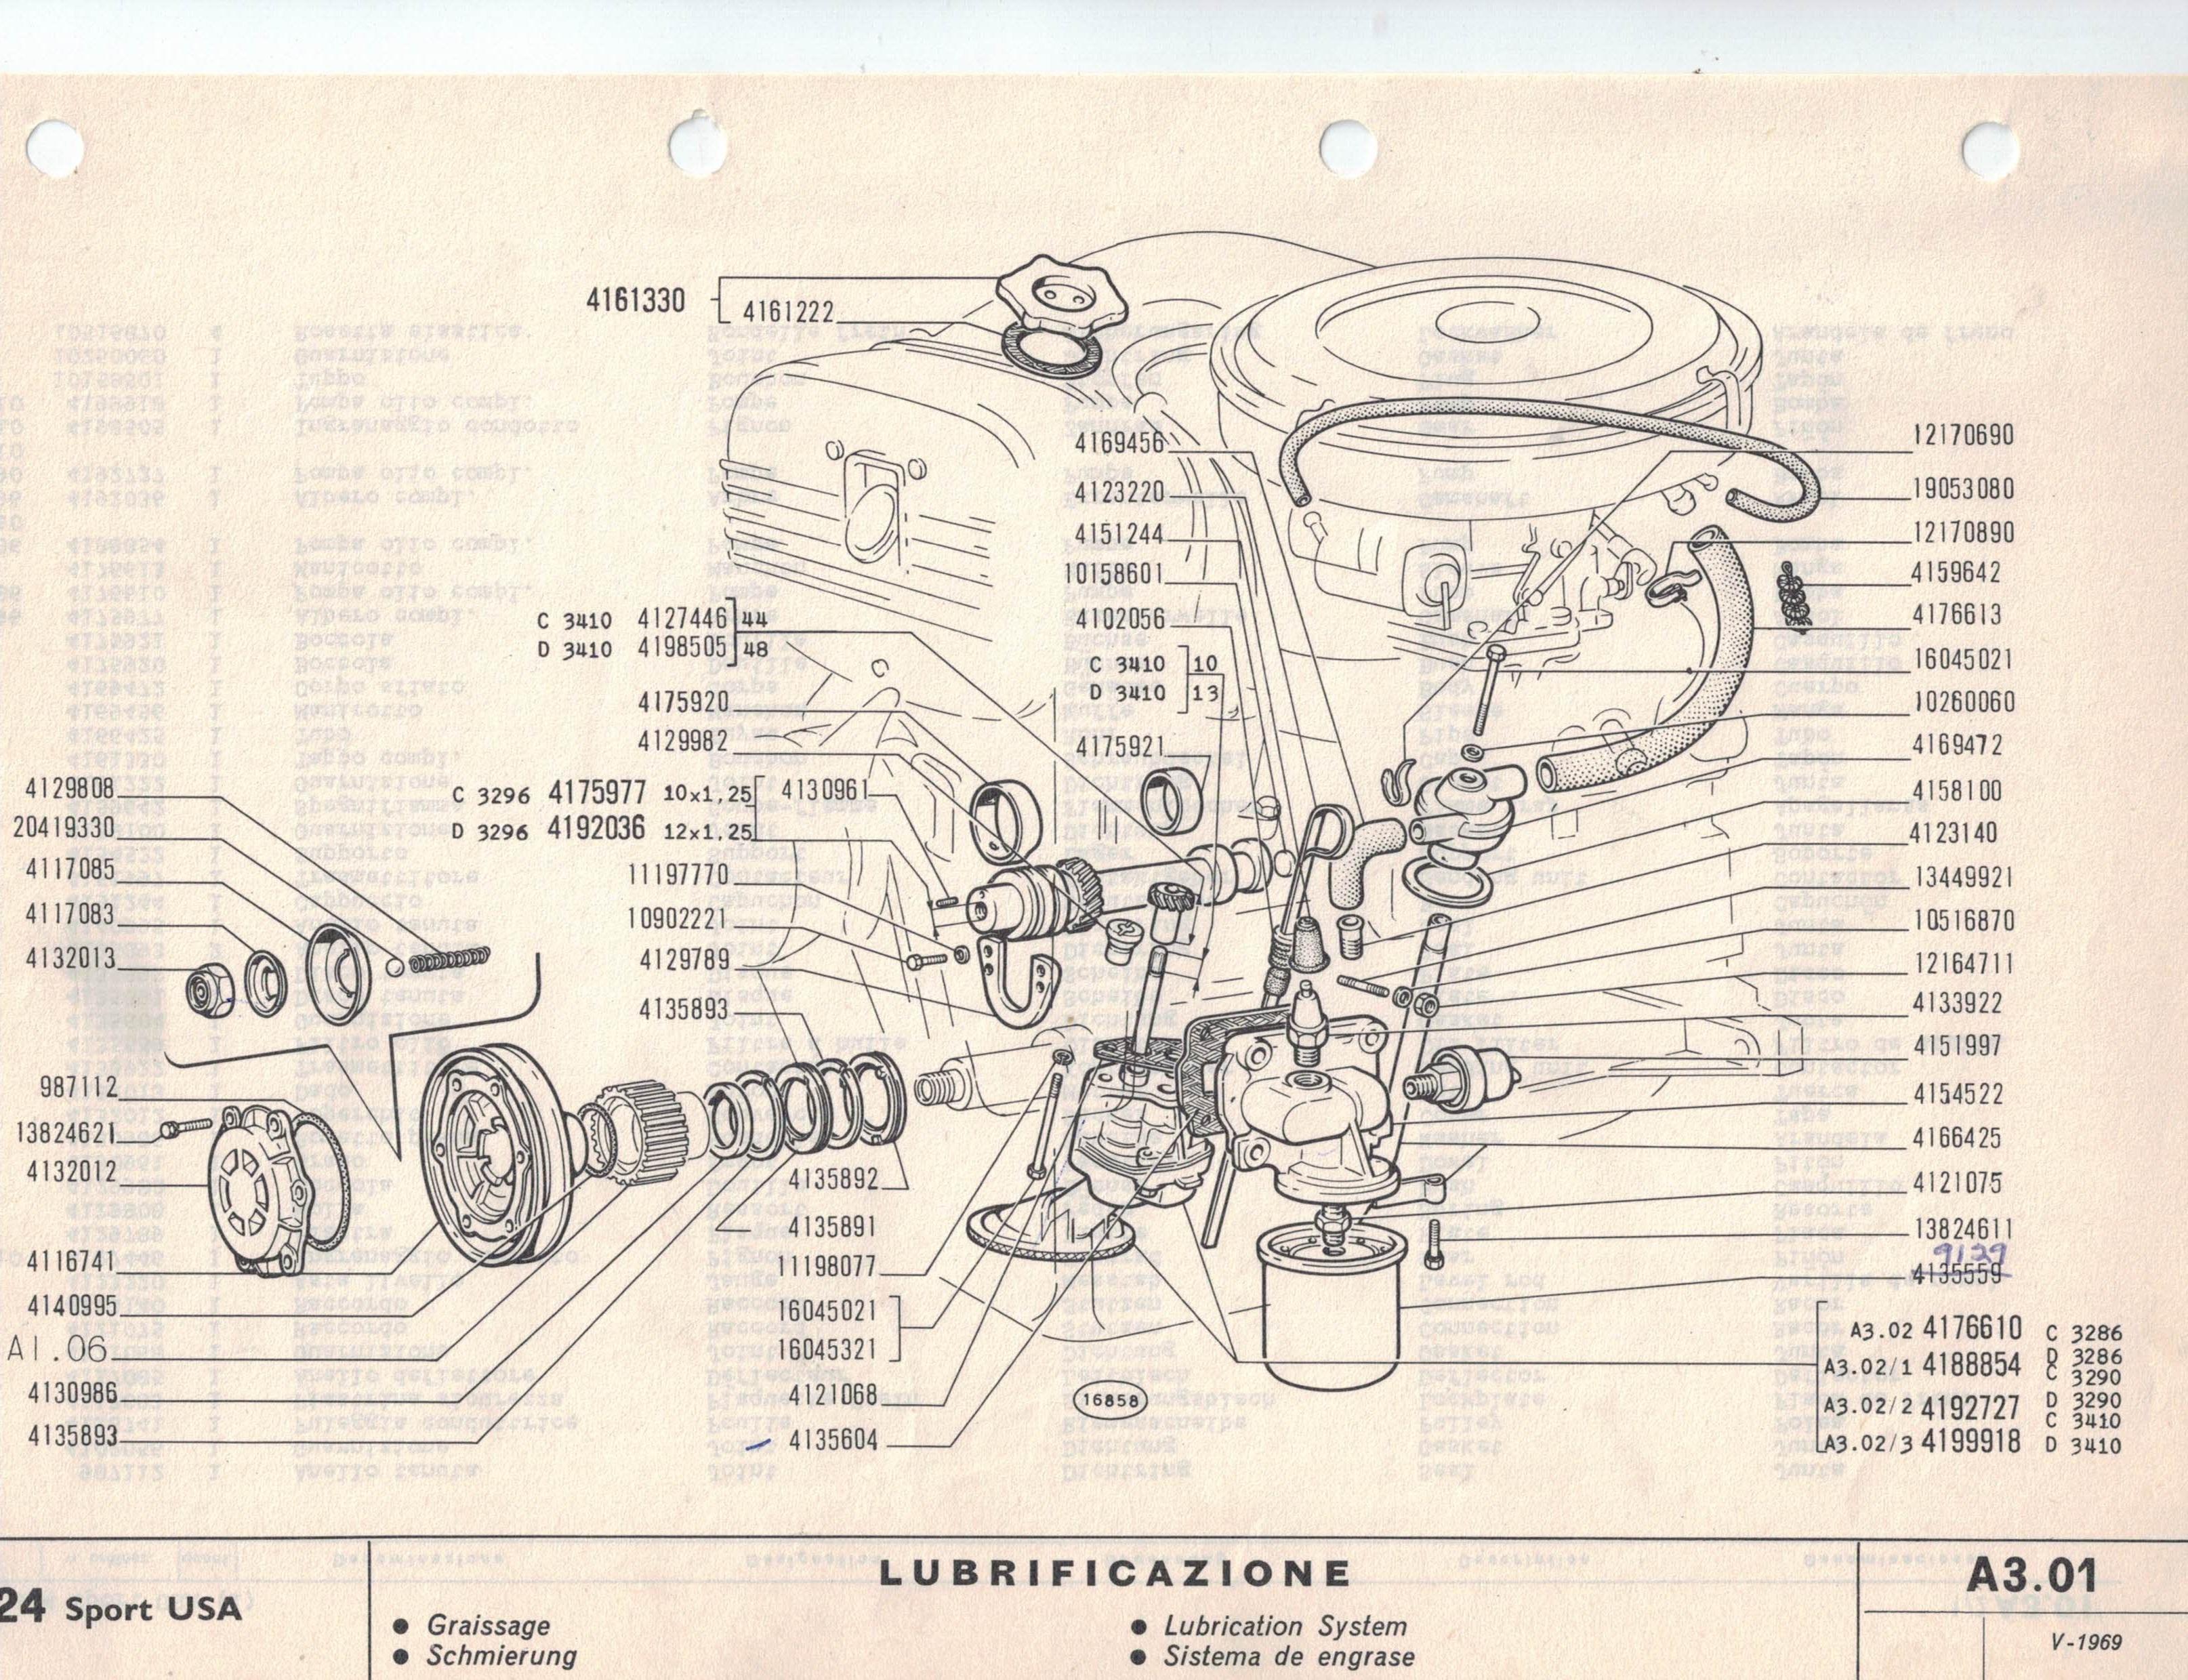 1978 fiat x19 wiring diagram 1978 fiat carburetor diagrams fiat spider parts